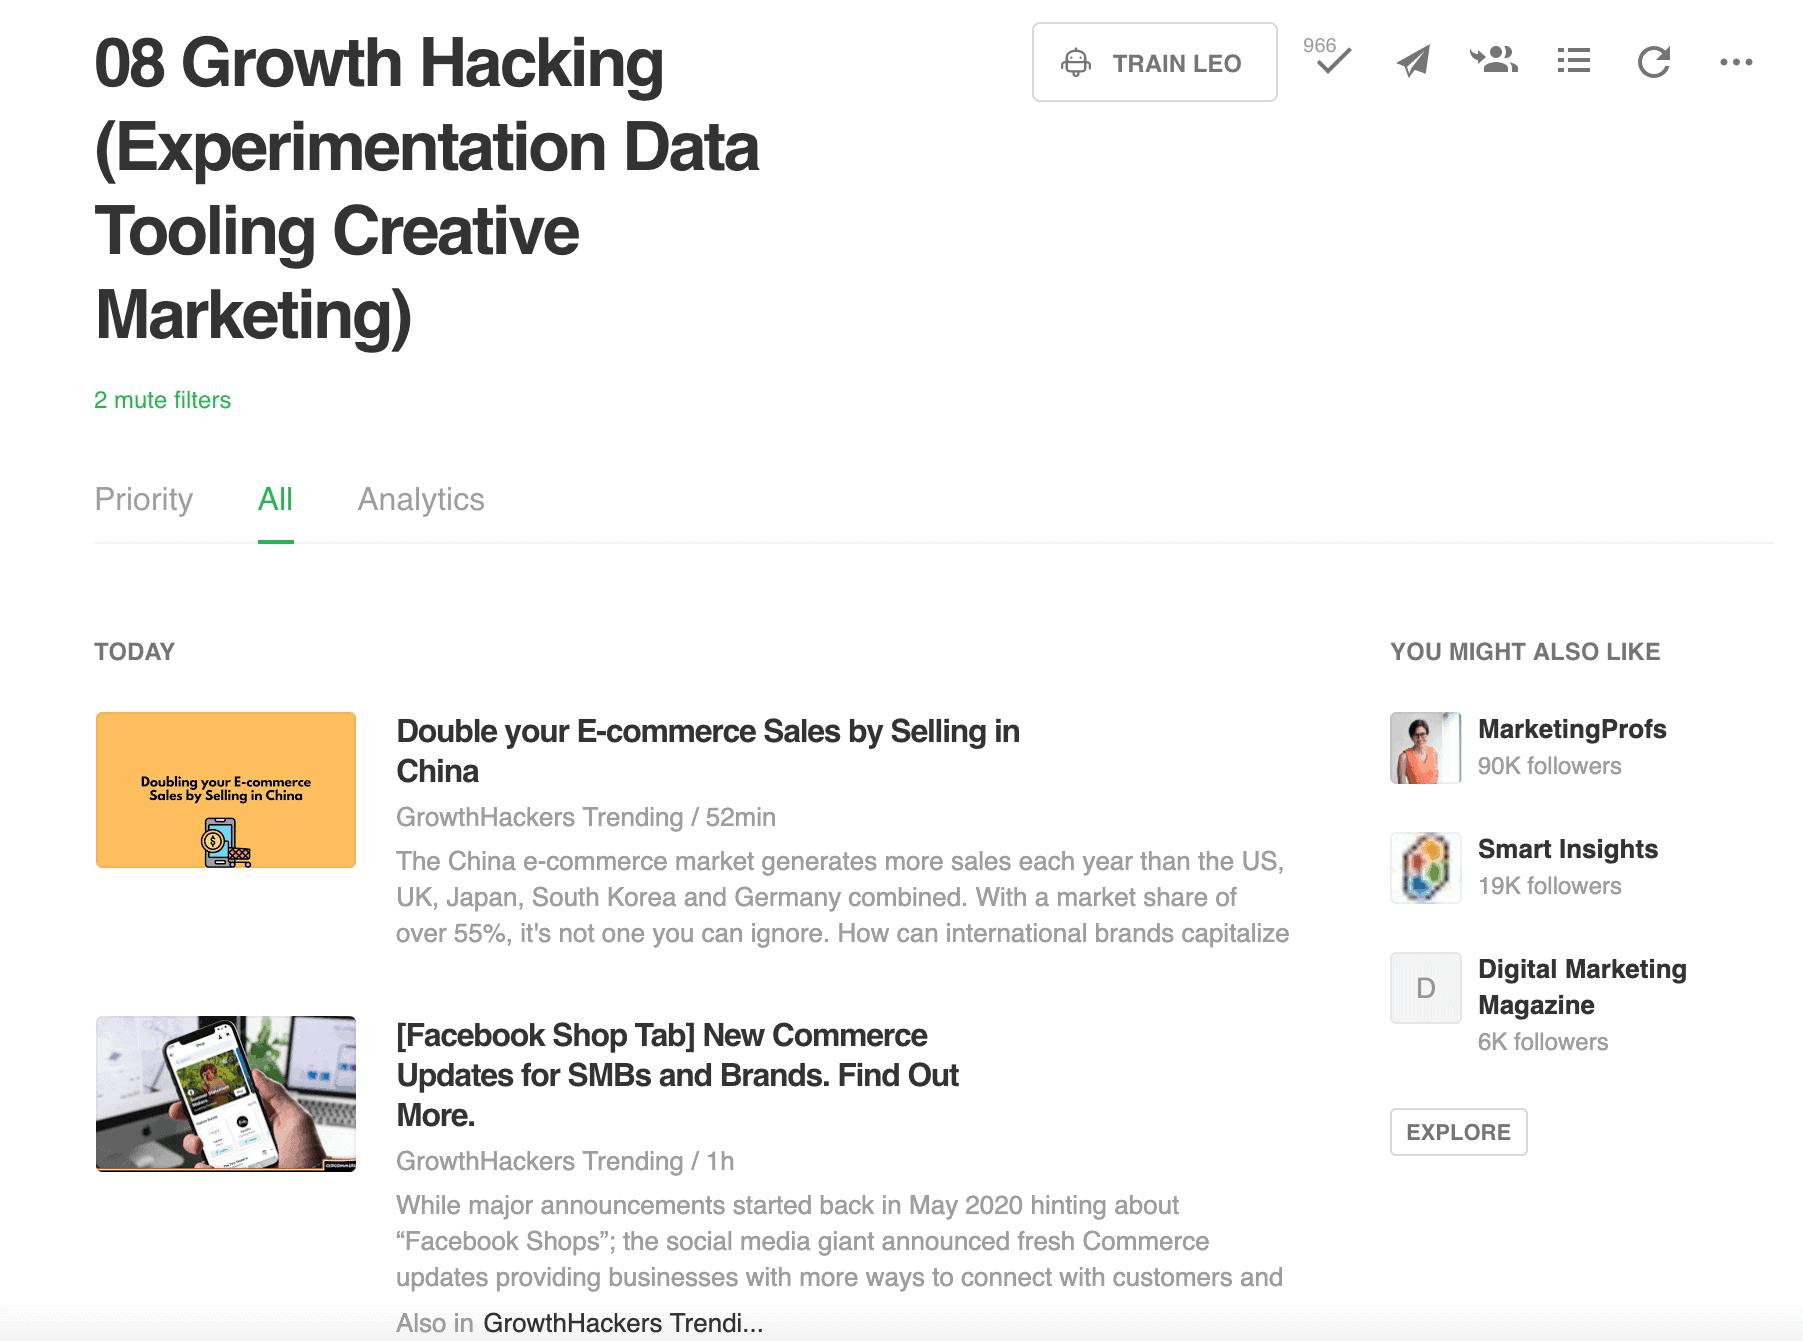 De Growth Hacking feed van Leapforce op ons Feedly account